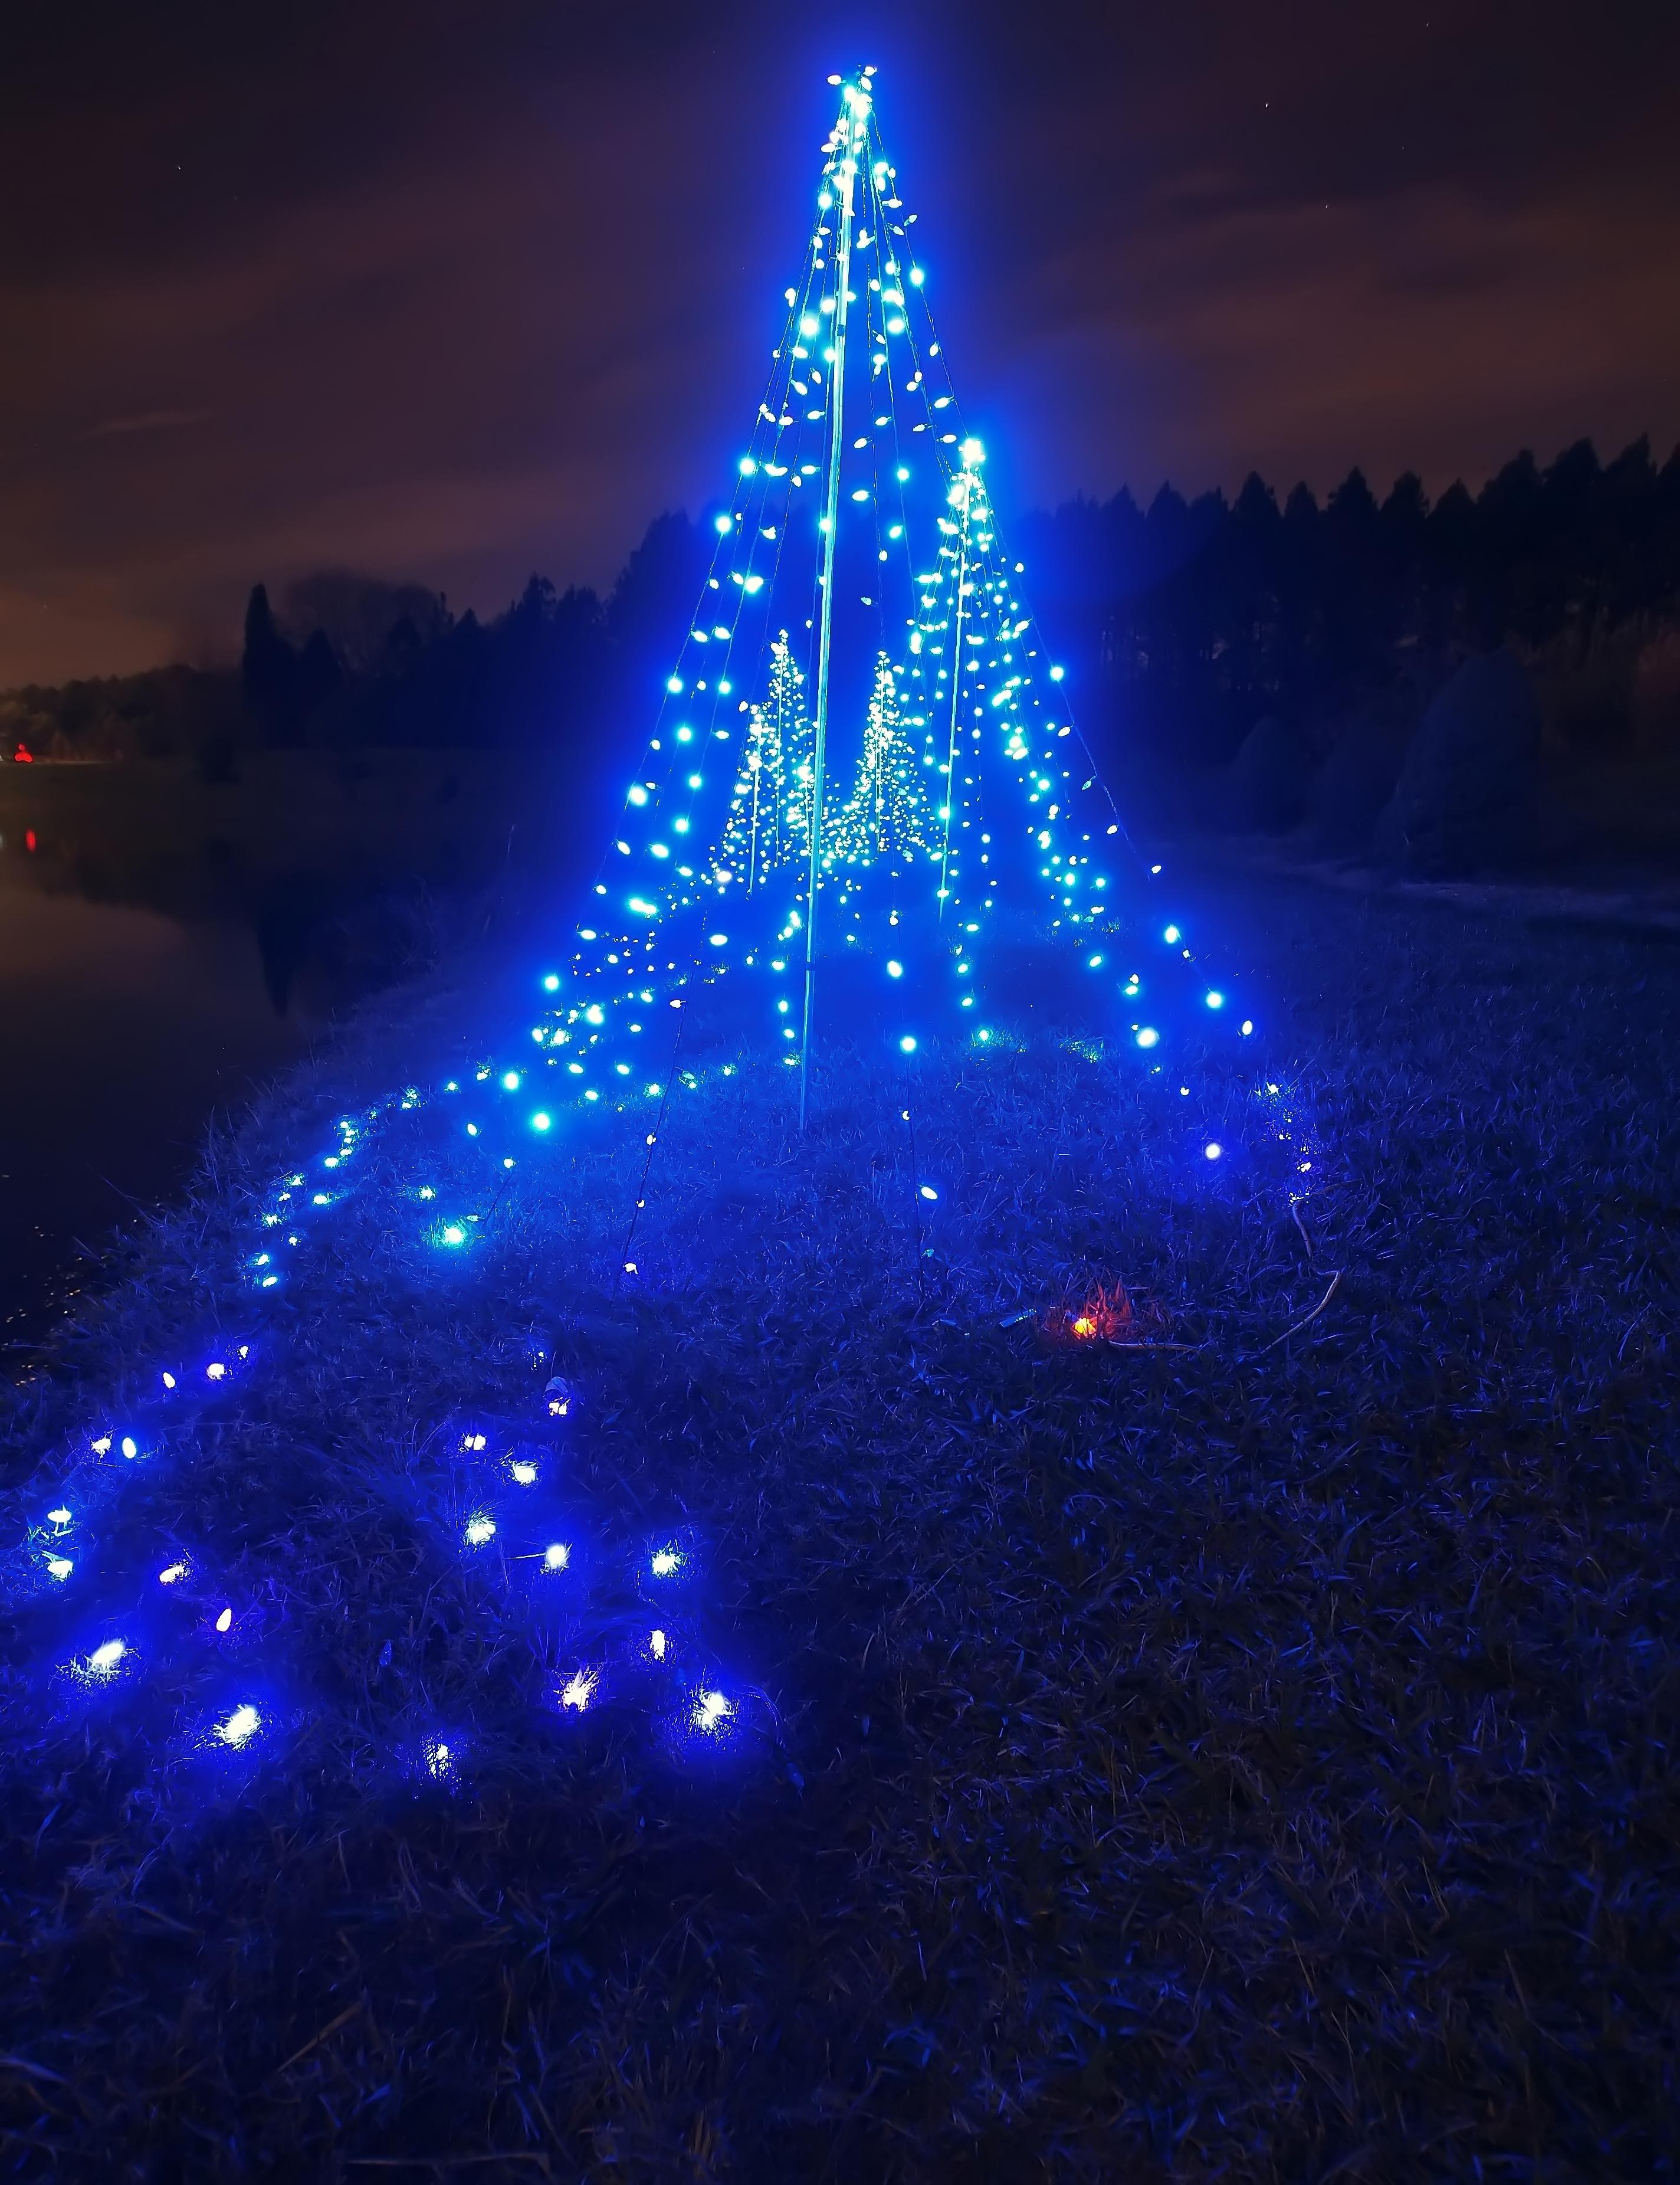 Blue christmas tree, Snow, Holiday, Ornamental, Reflection, HQ Photo